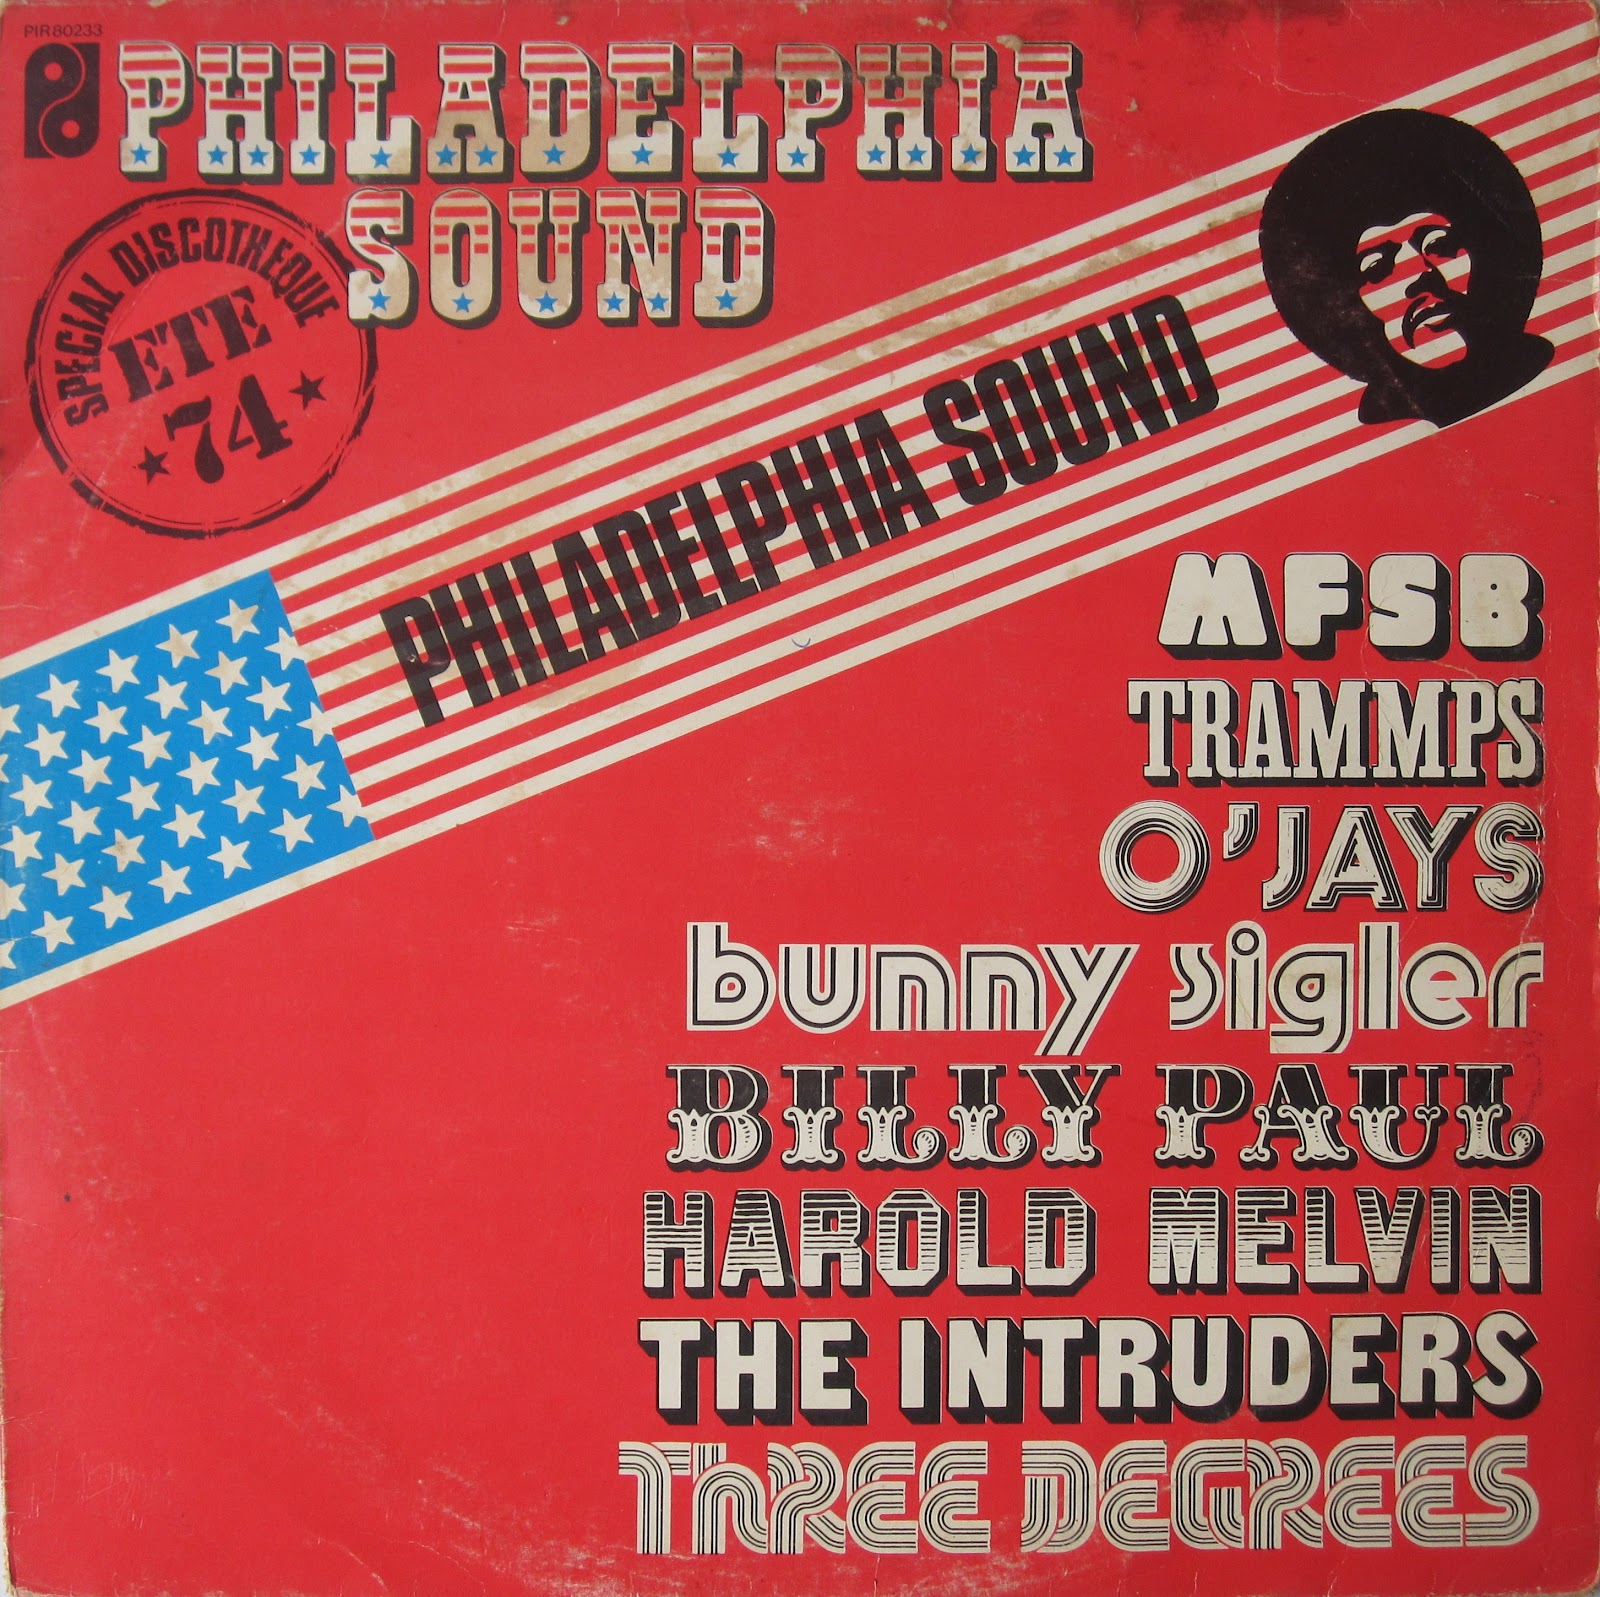 Philly Sound